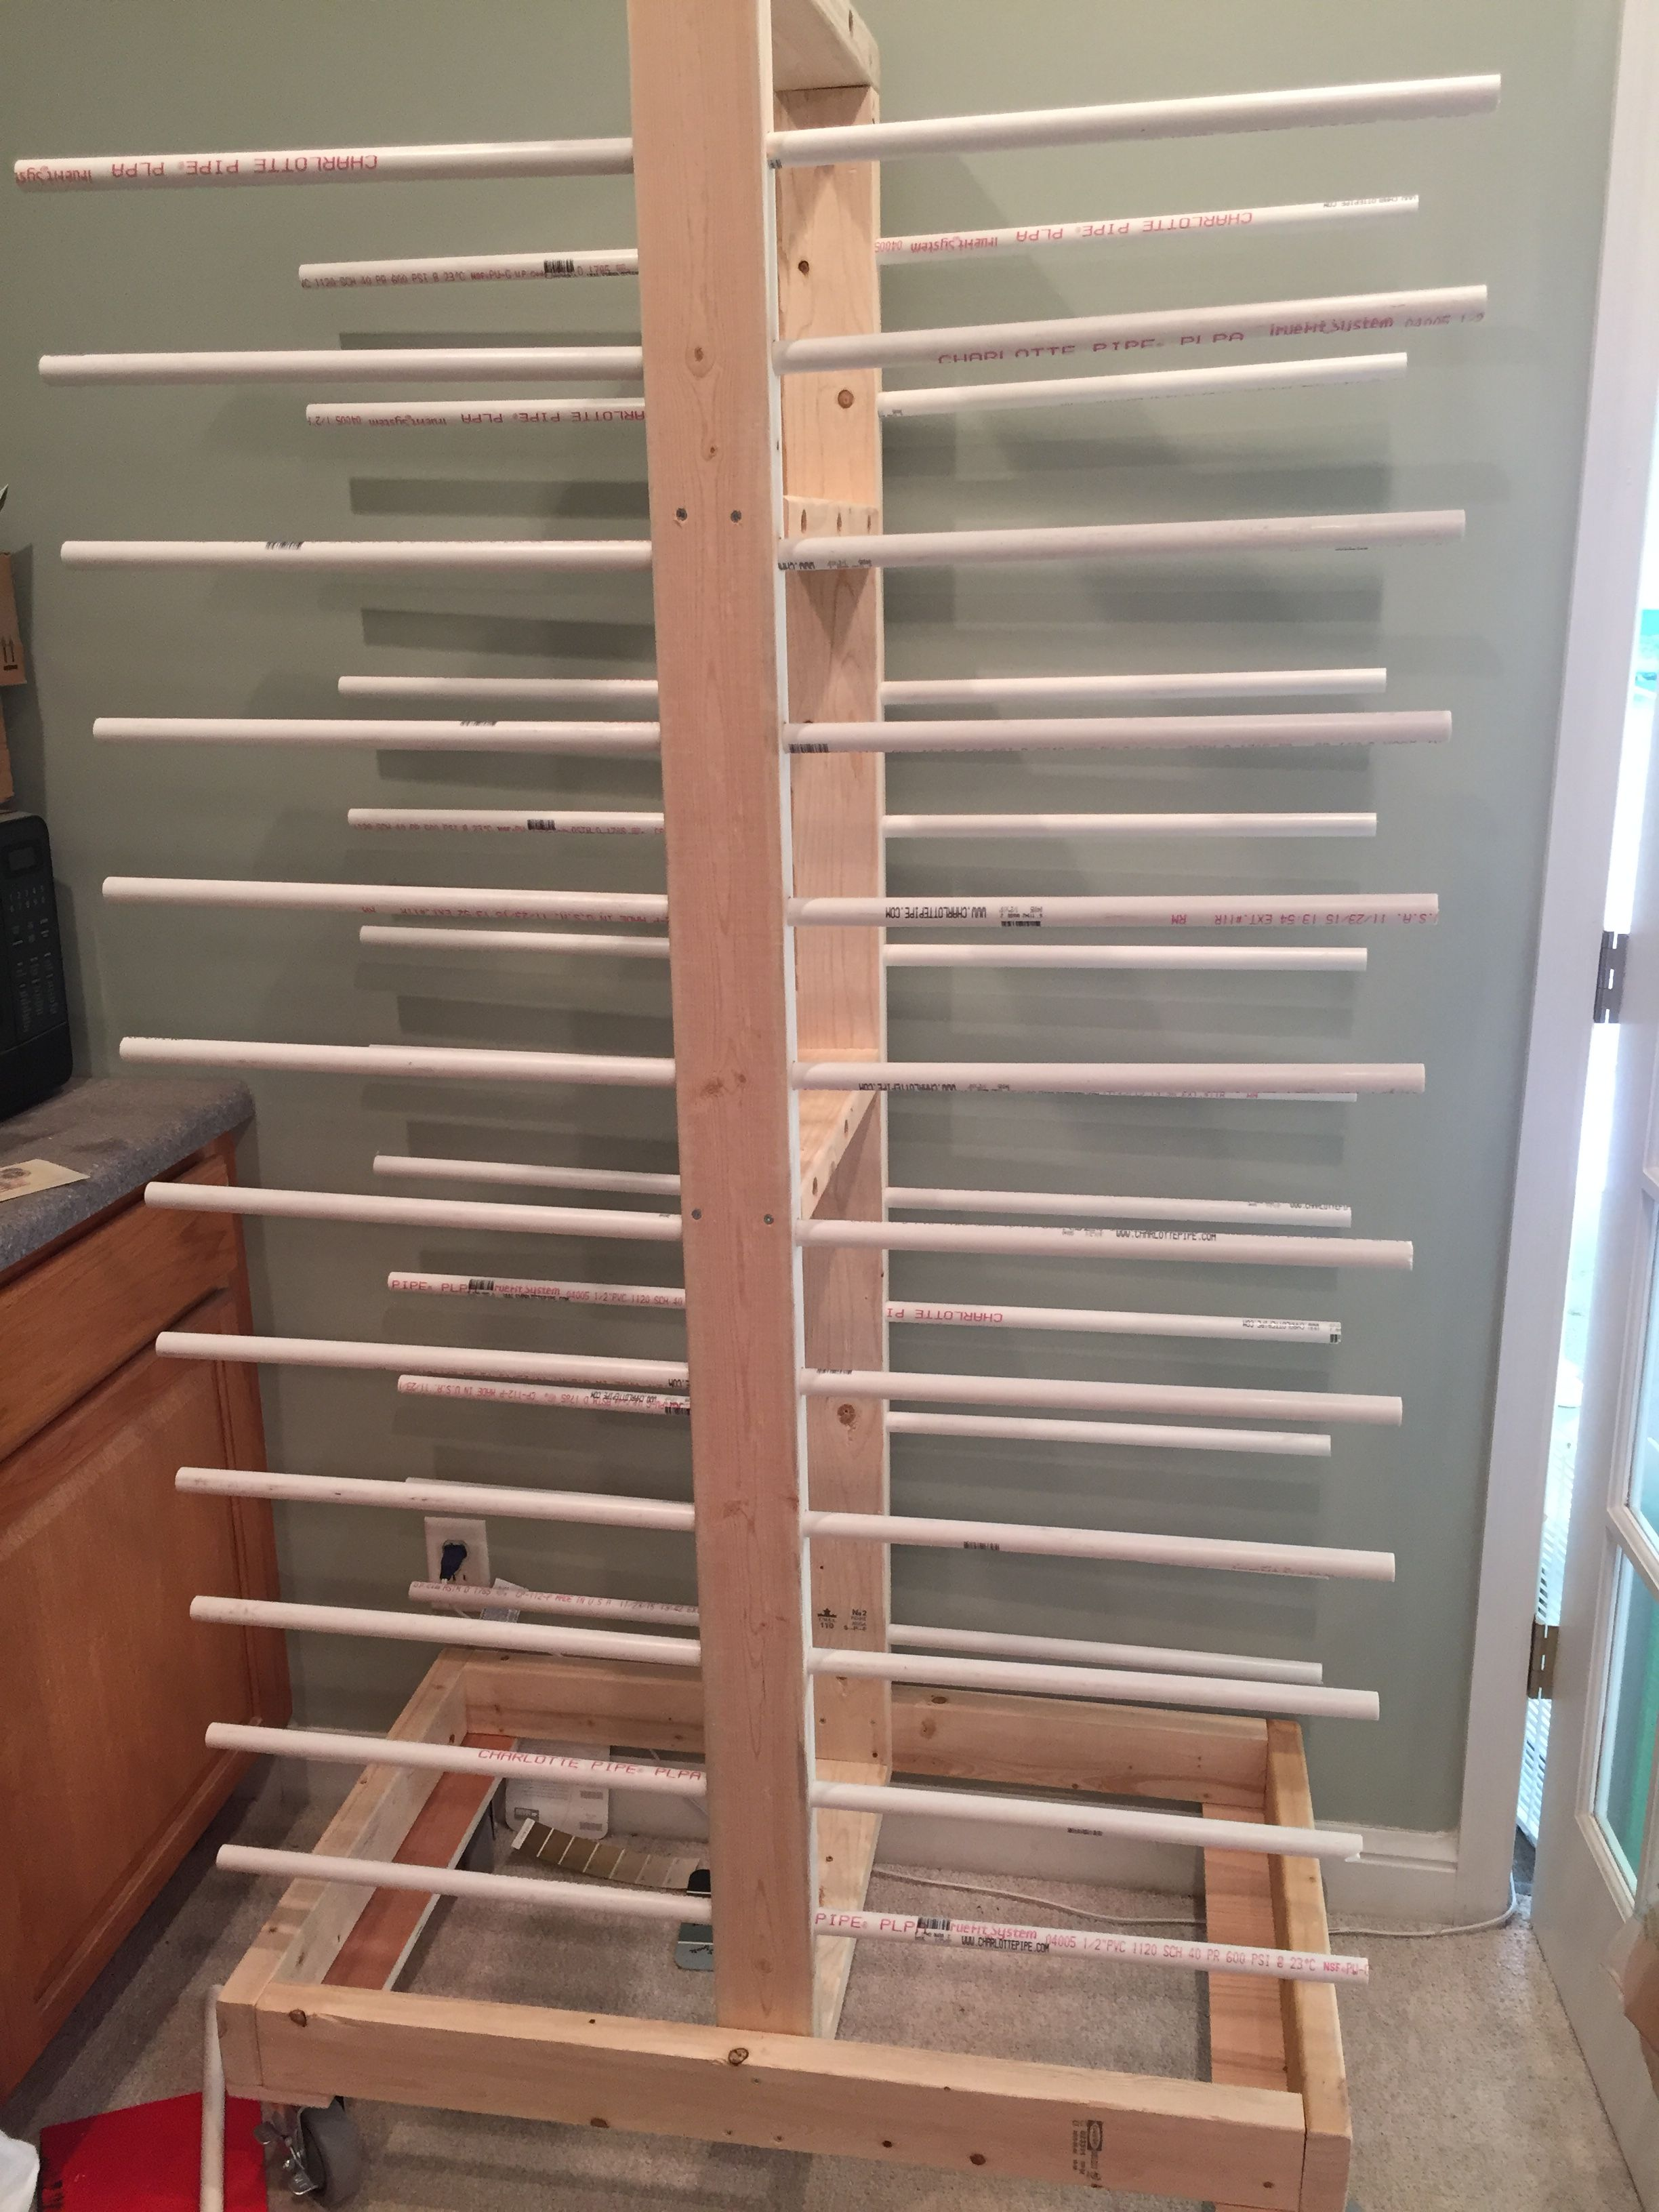 DIY Cabinet door drying rack from pvc pipe  2x4 lumber